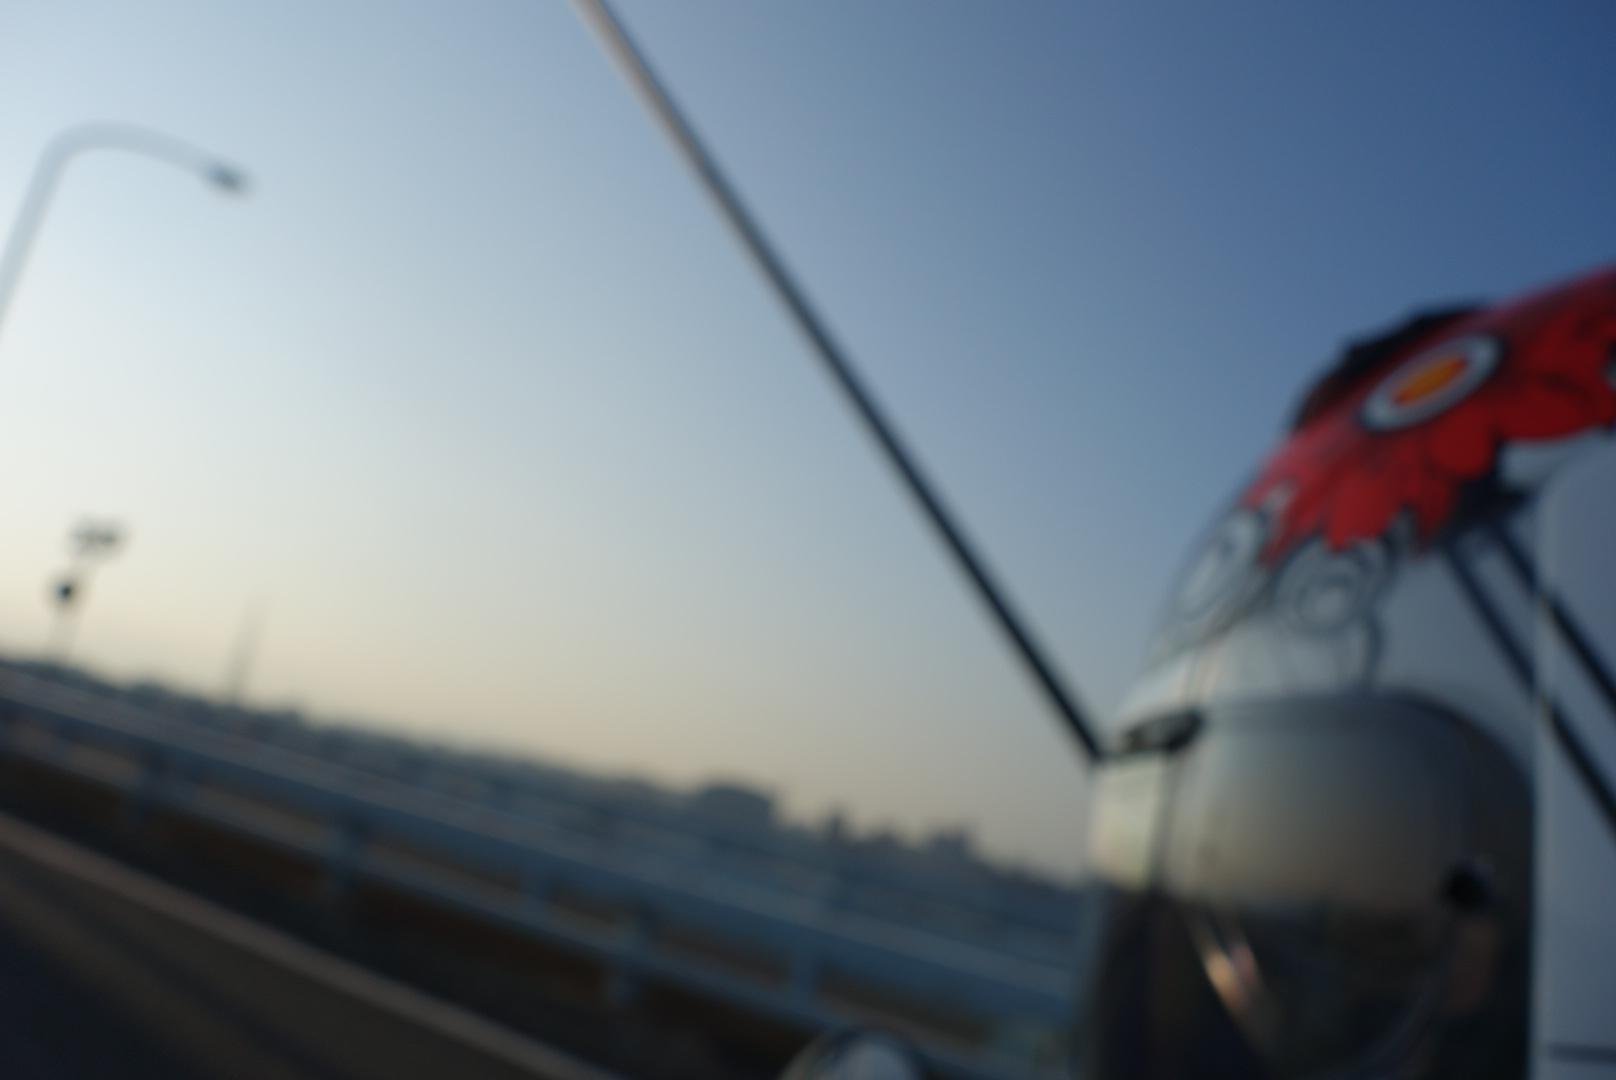 IMG_9412.JPG